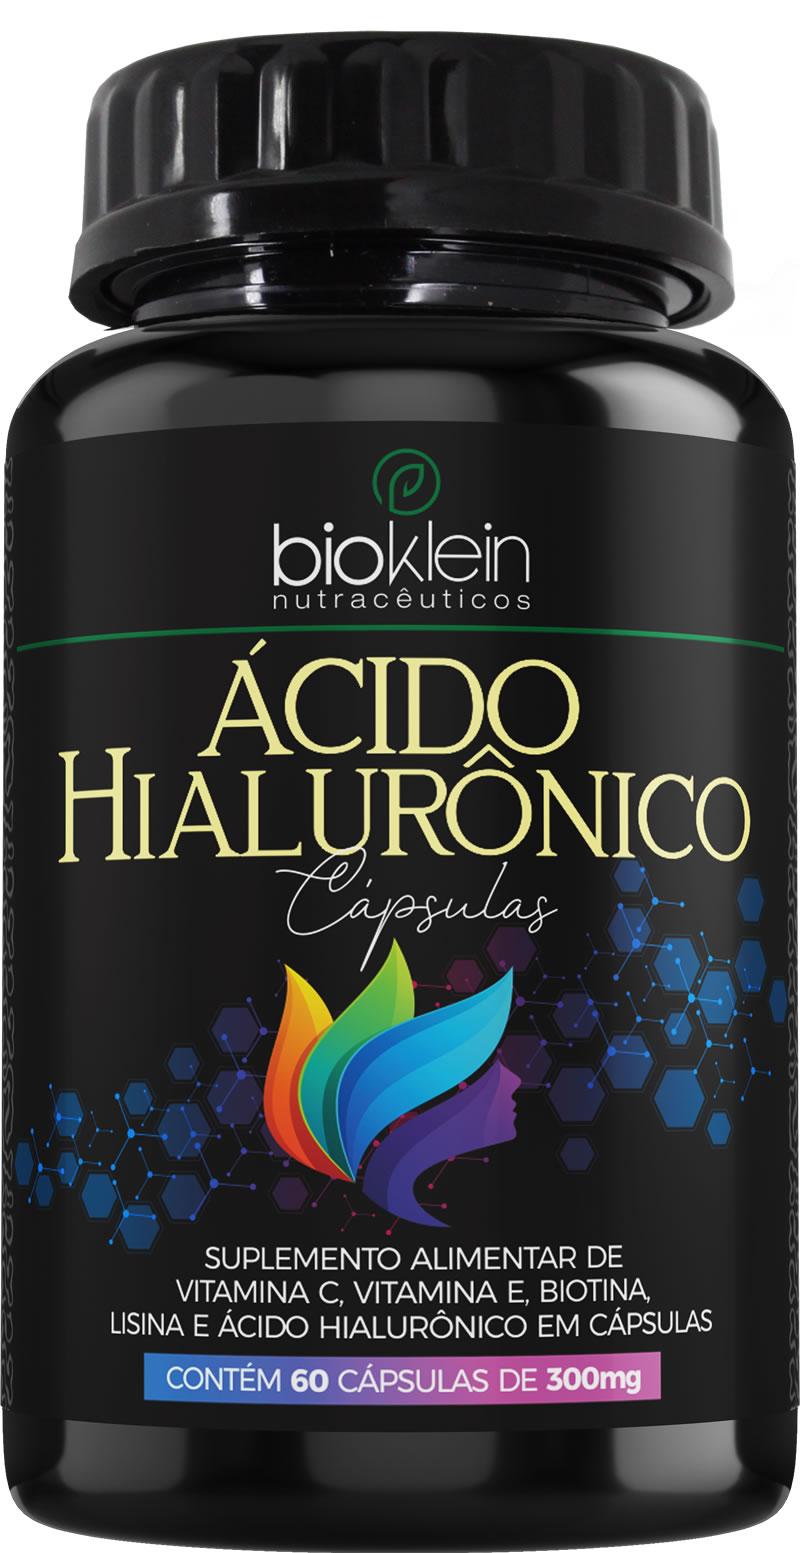 Ácido Hialurônico 150mg 60 Cáps c/ Vit C E Bioklein